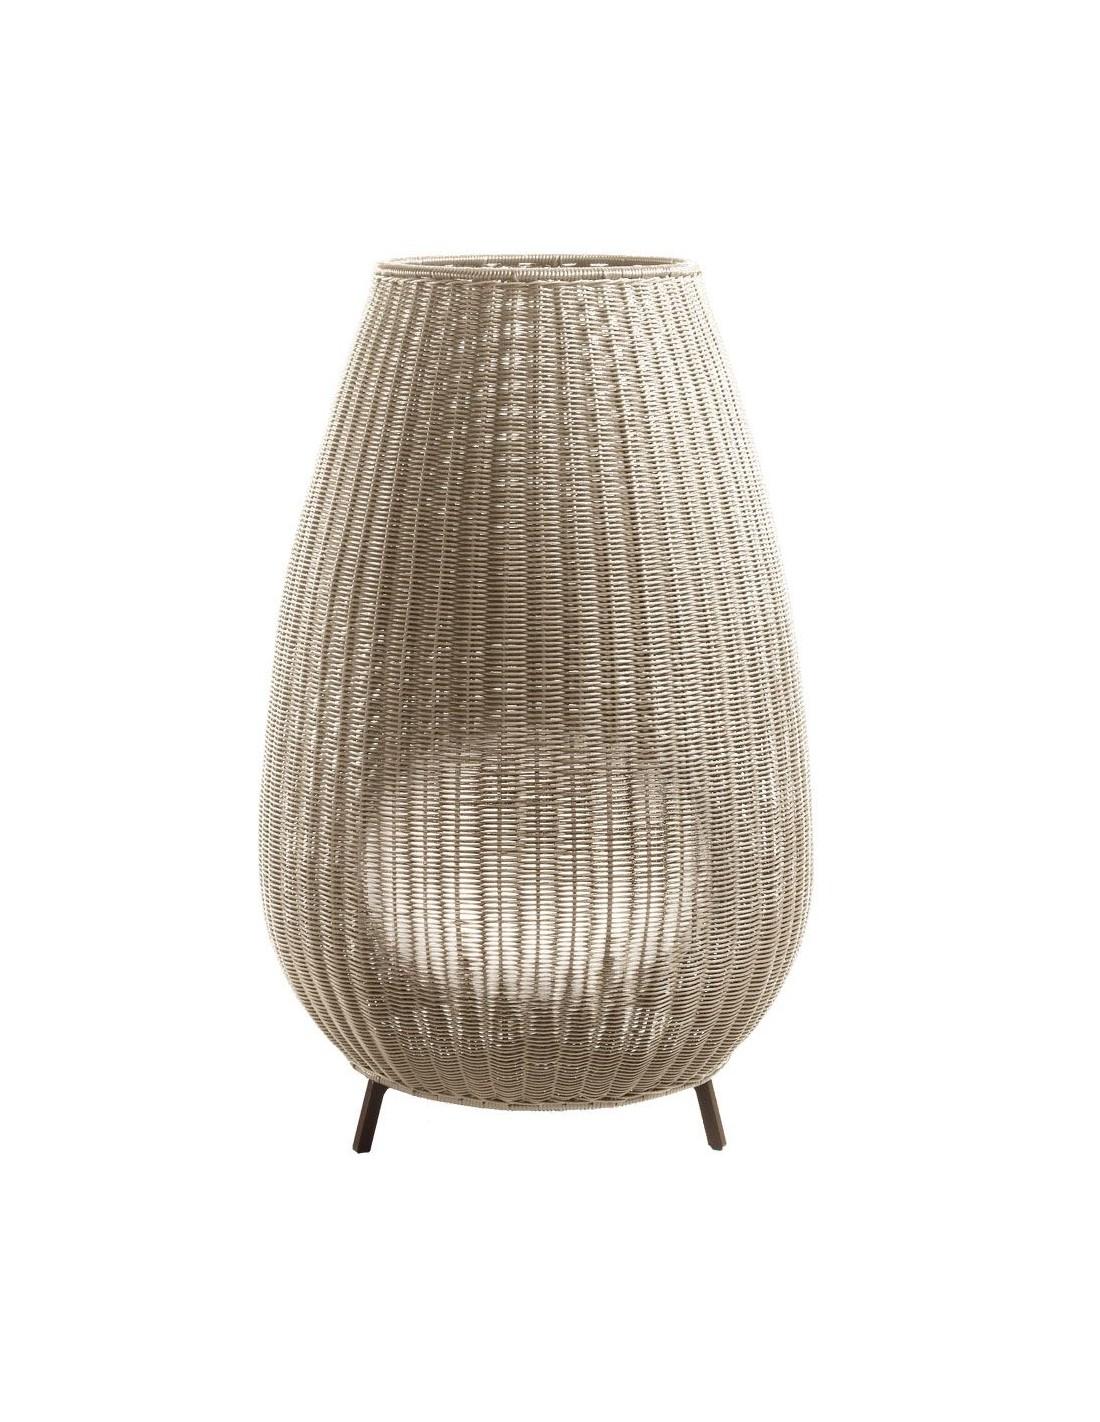 Lampe poser amphora 01 valente design for Lampe exterieur a poser